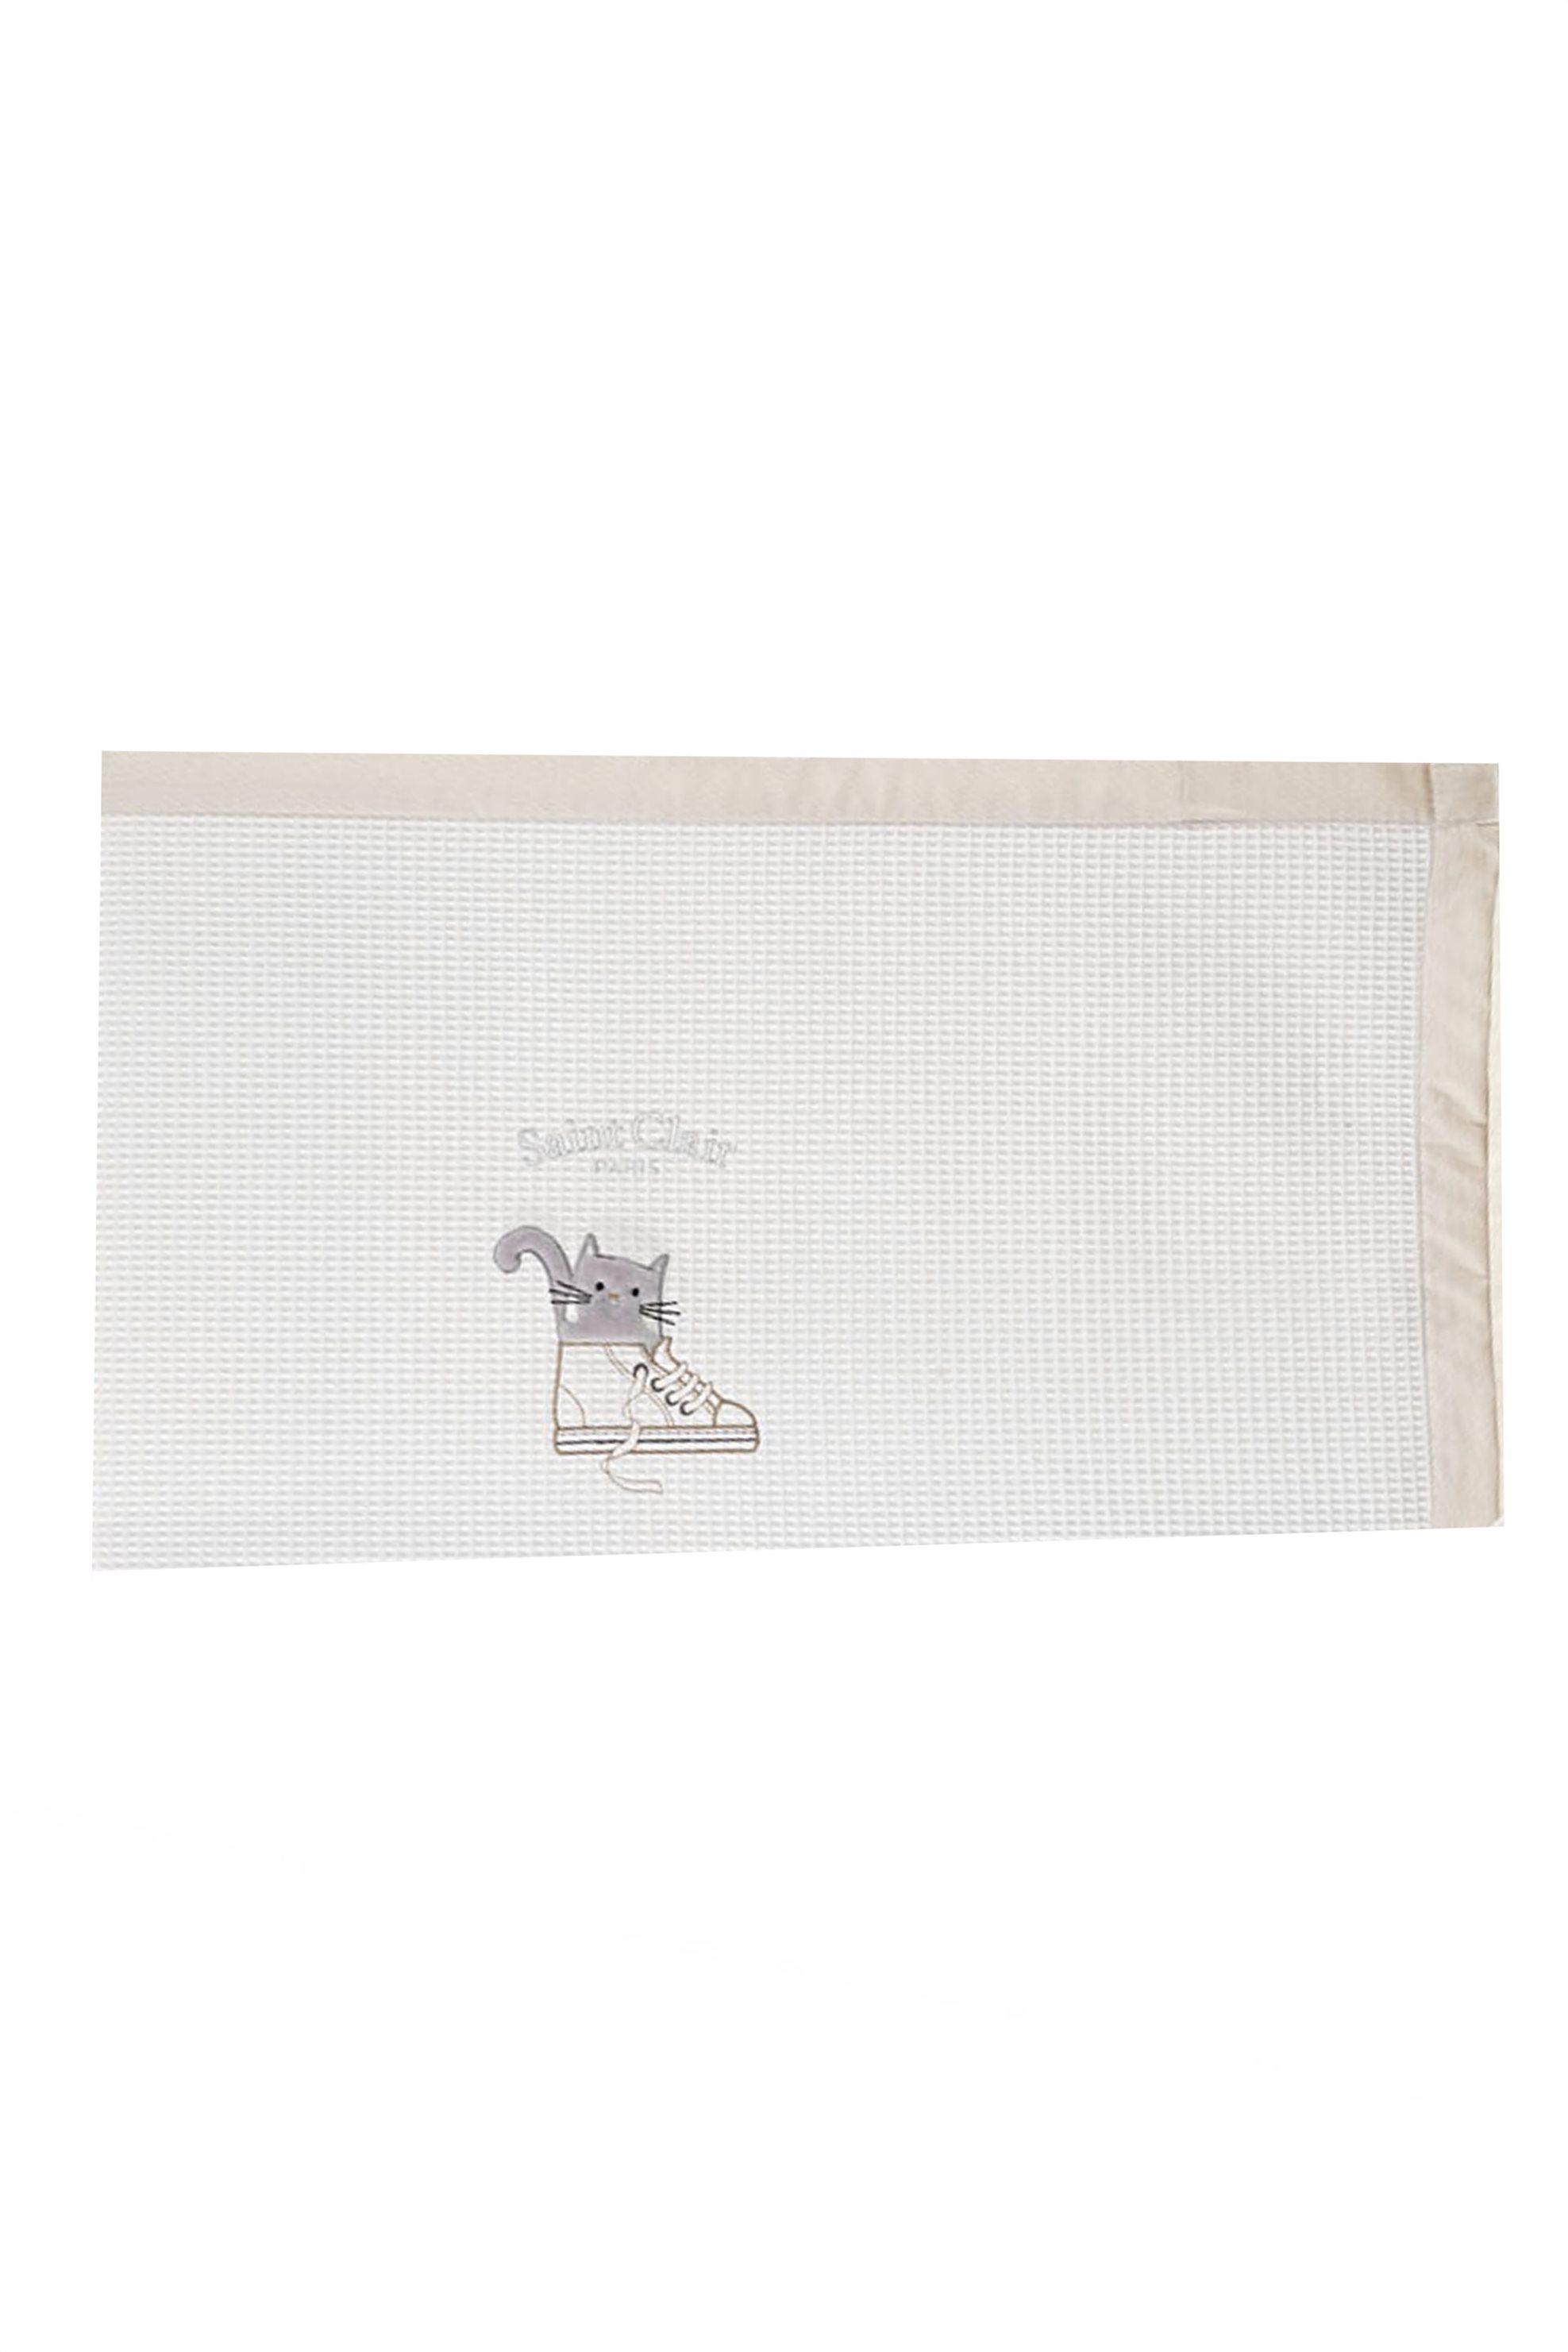 Saint Clair Paris Κουβέρτα πικέ για βρεφικό δωμάτιο Max 110 x 150 cm - 171309021 home   παιδια   κουβέρτες